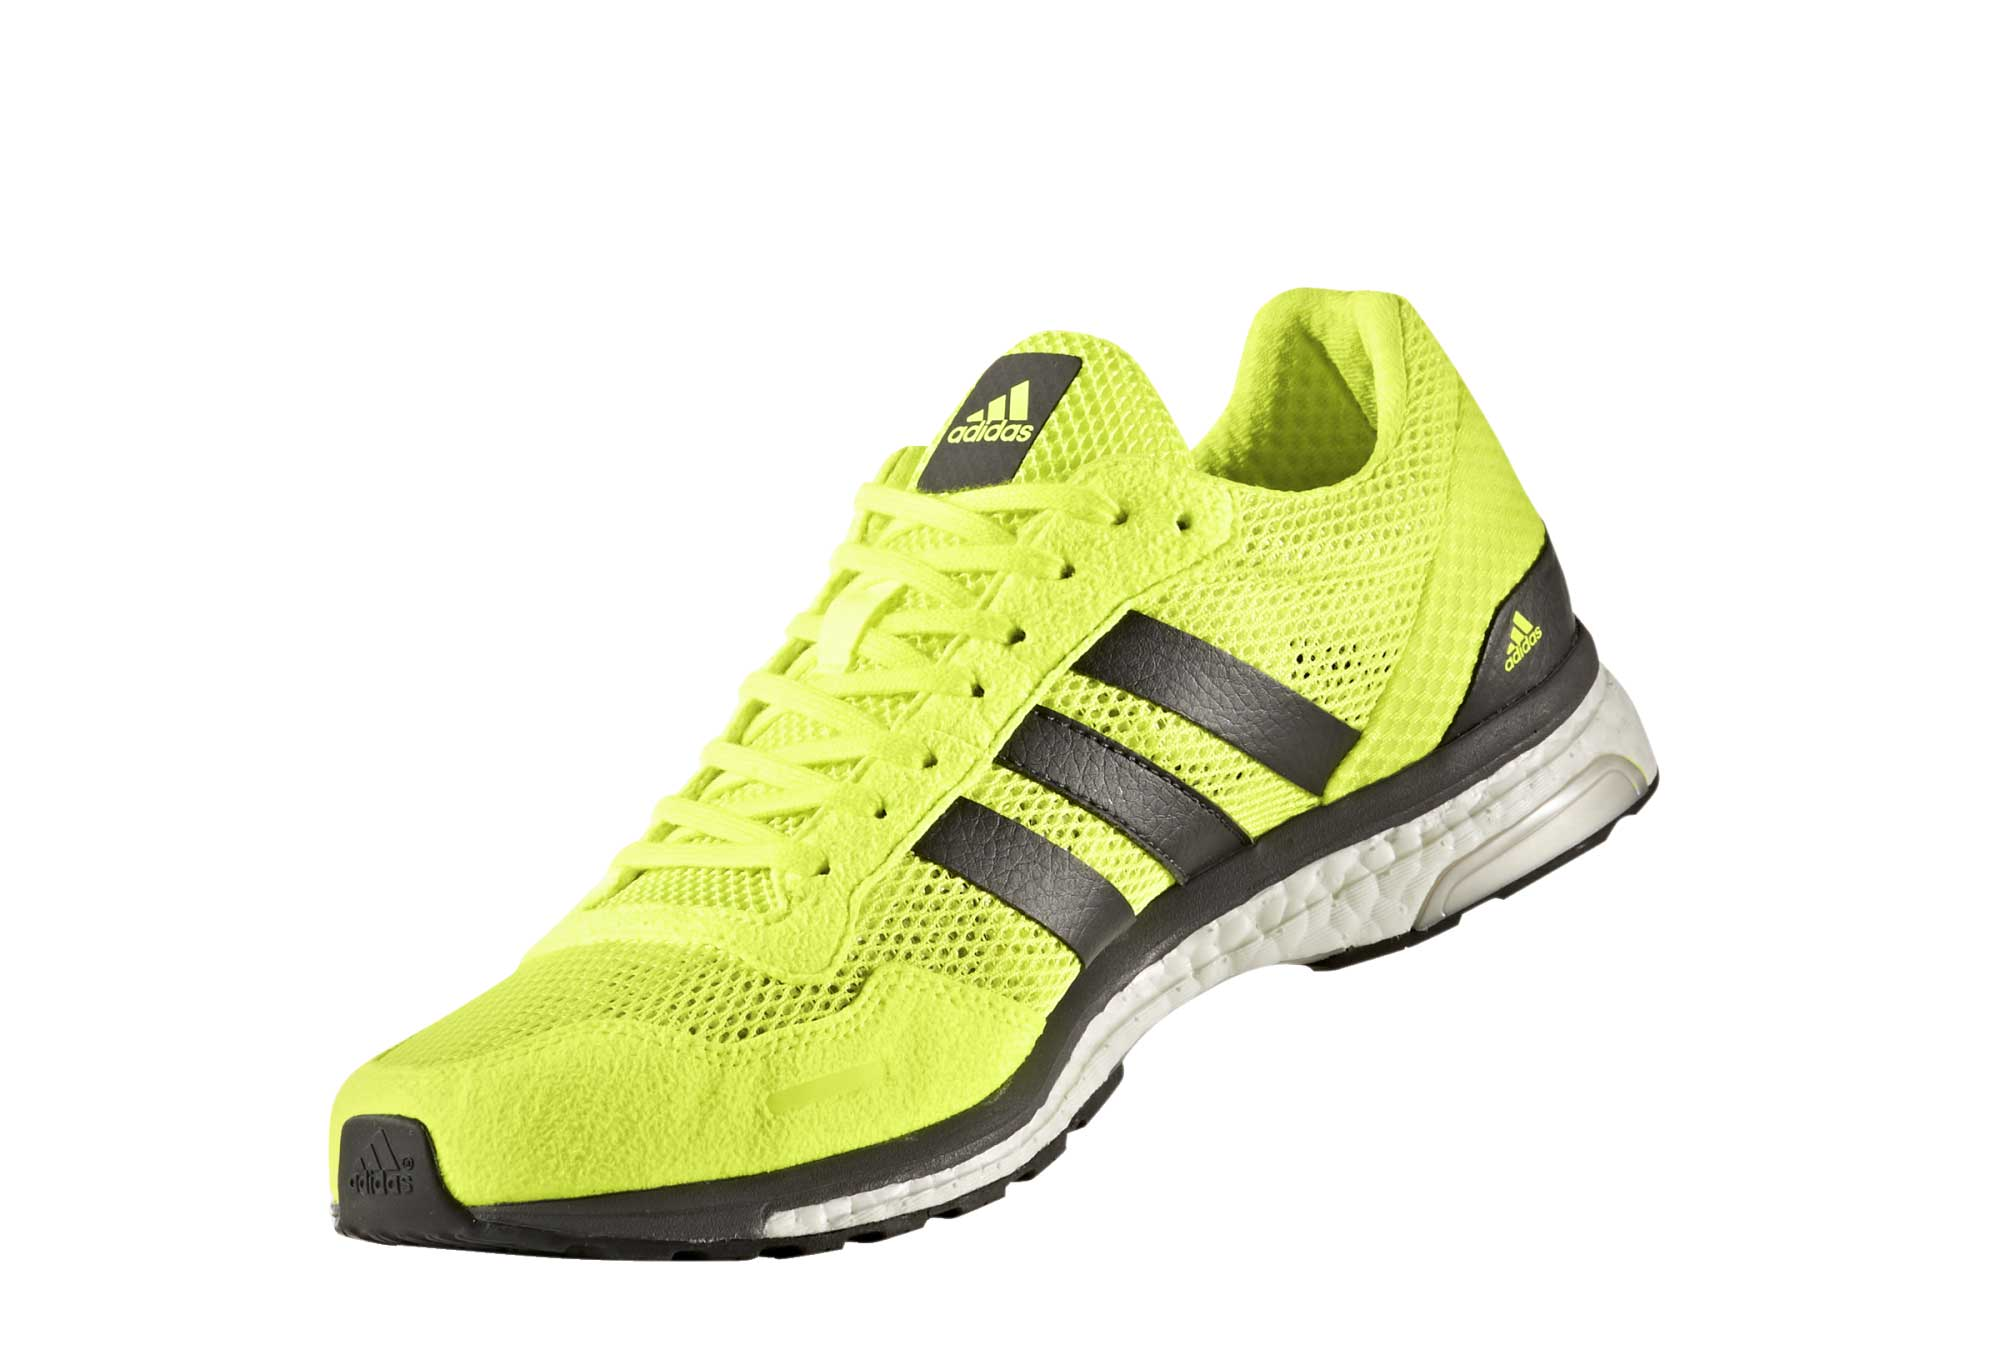 check out 2eeb9 c3443 adidas running Adizero Adios 3 Neon Yellow Black Men